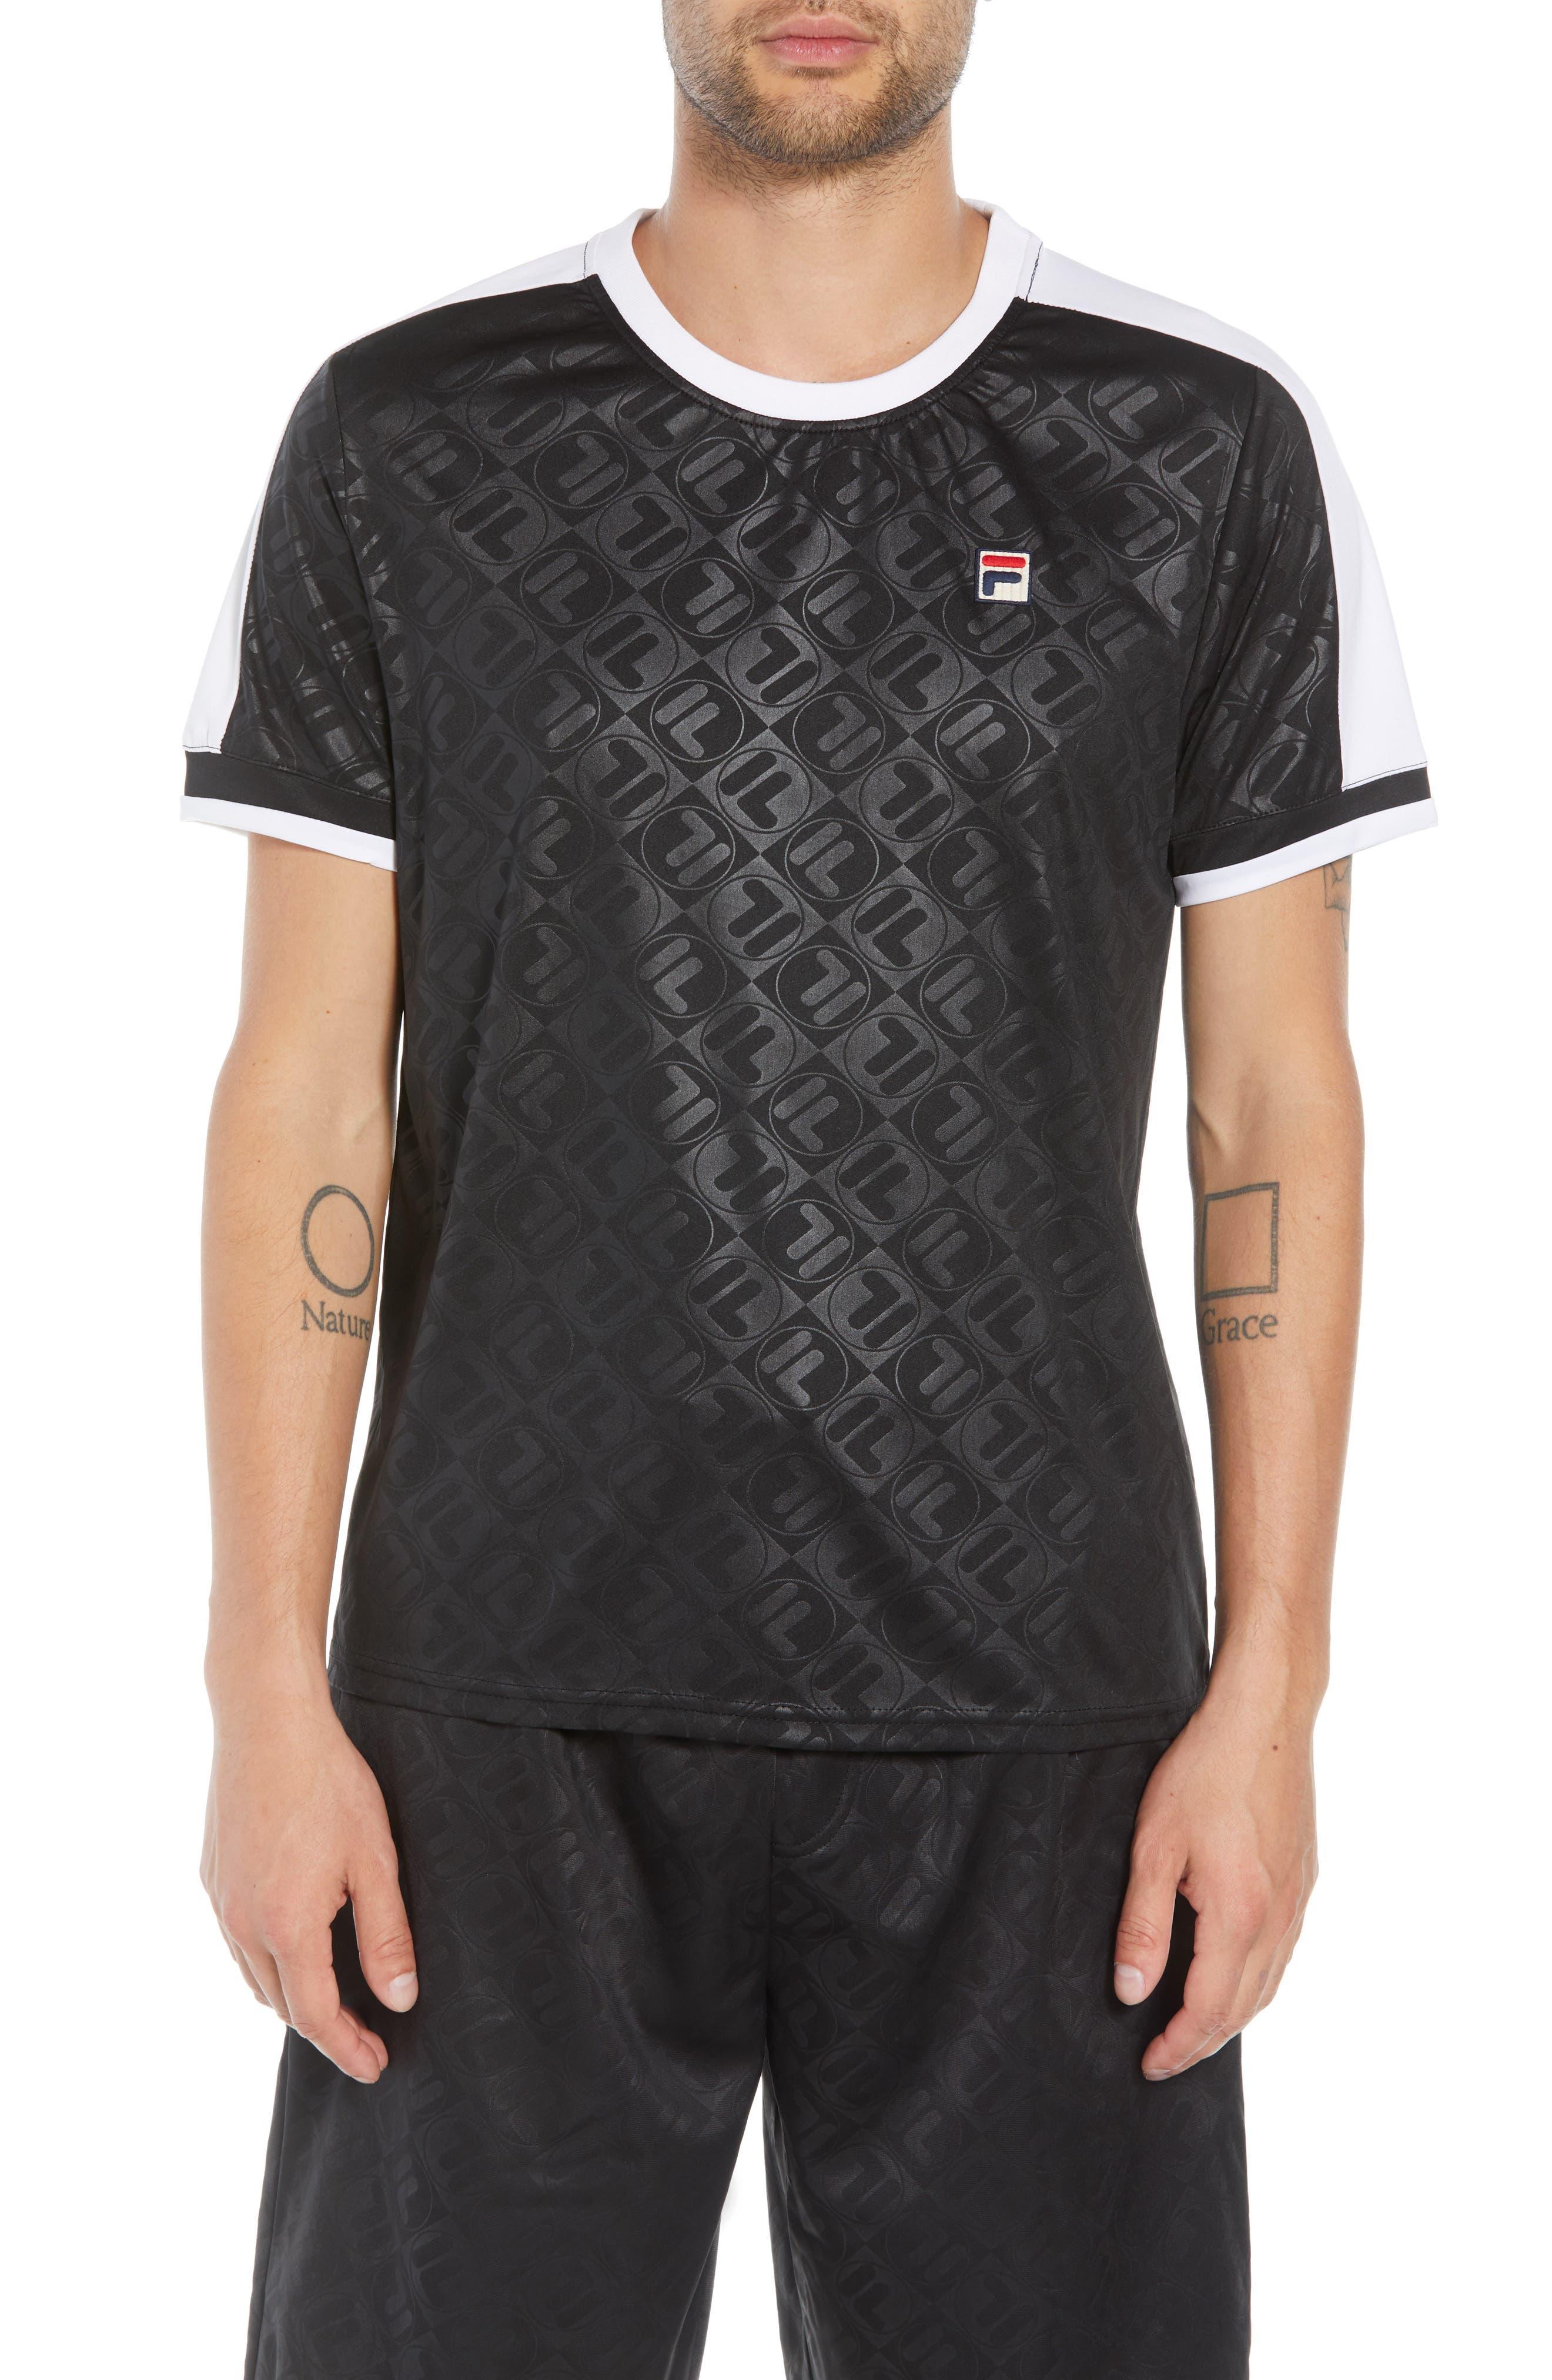 Marc Interlock Soccer T-Shirt,                             Main thumbnail 1, color,                             001